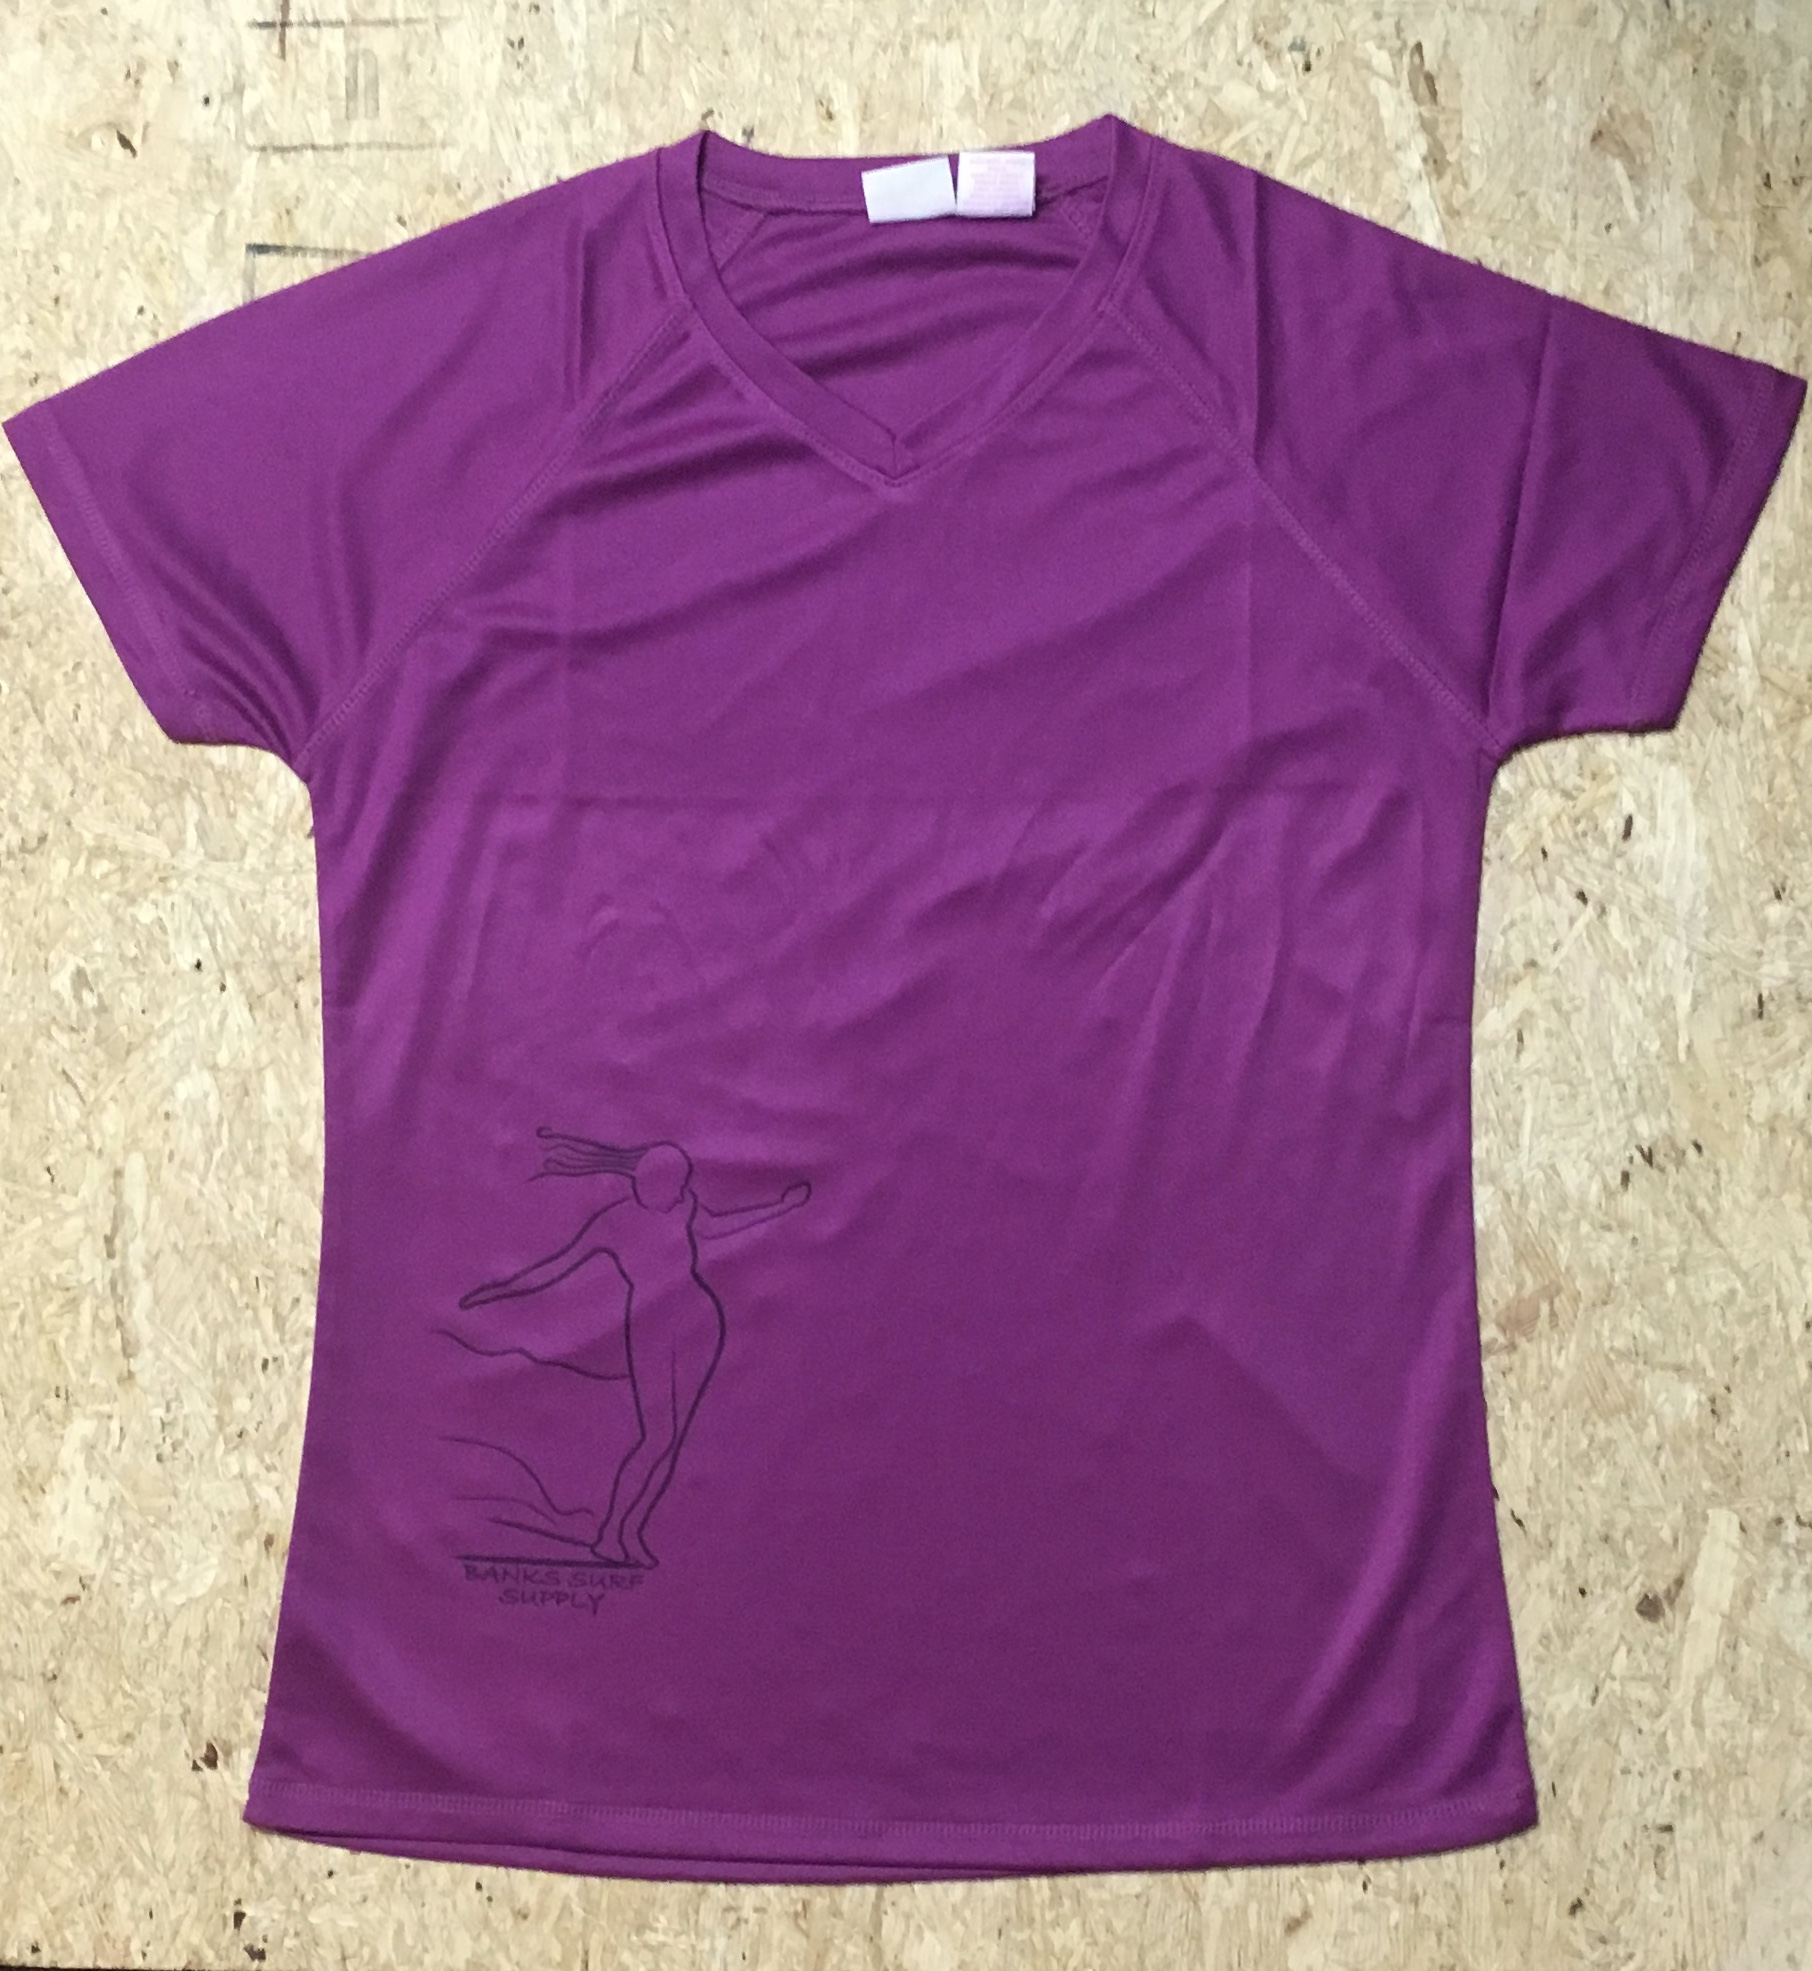 a6890cca Banks Surf Supply Noserider Ladies Short Sleeve Rashguard Purple Orchid